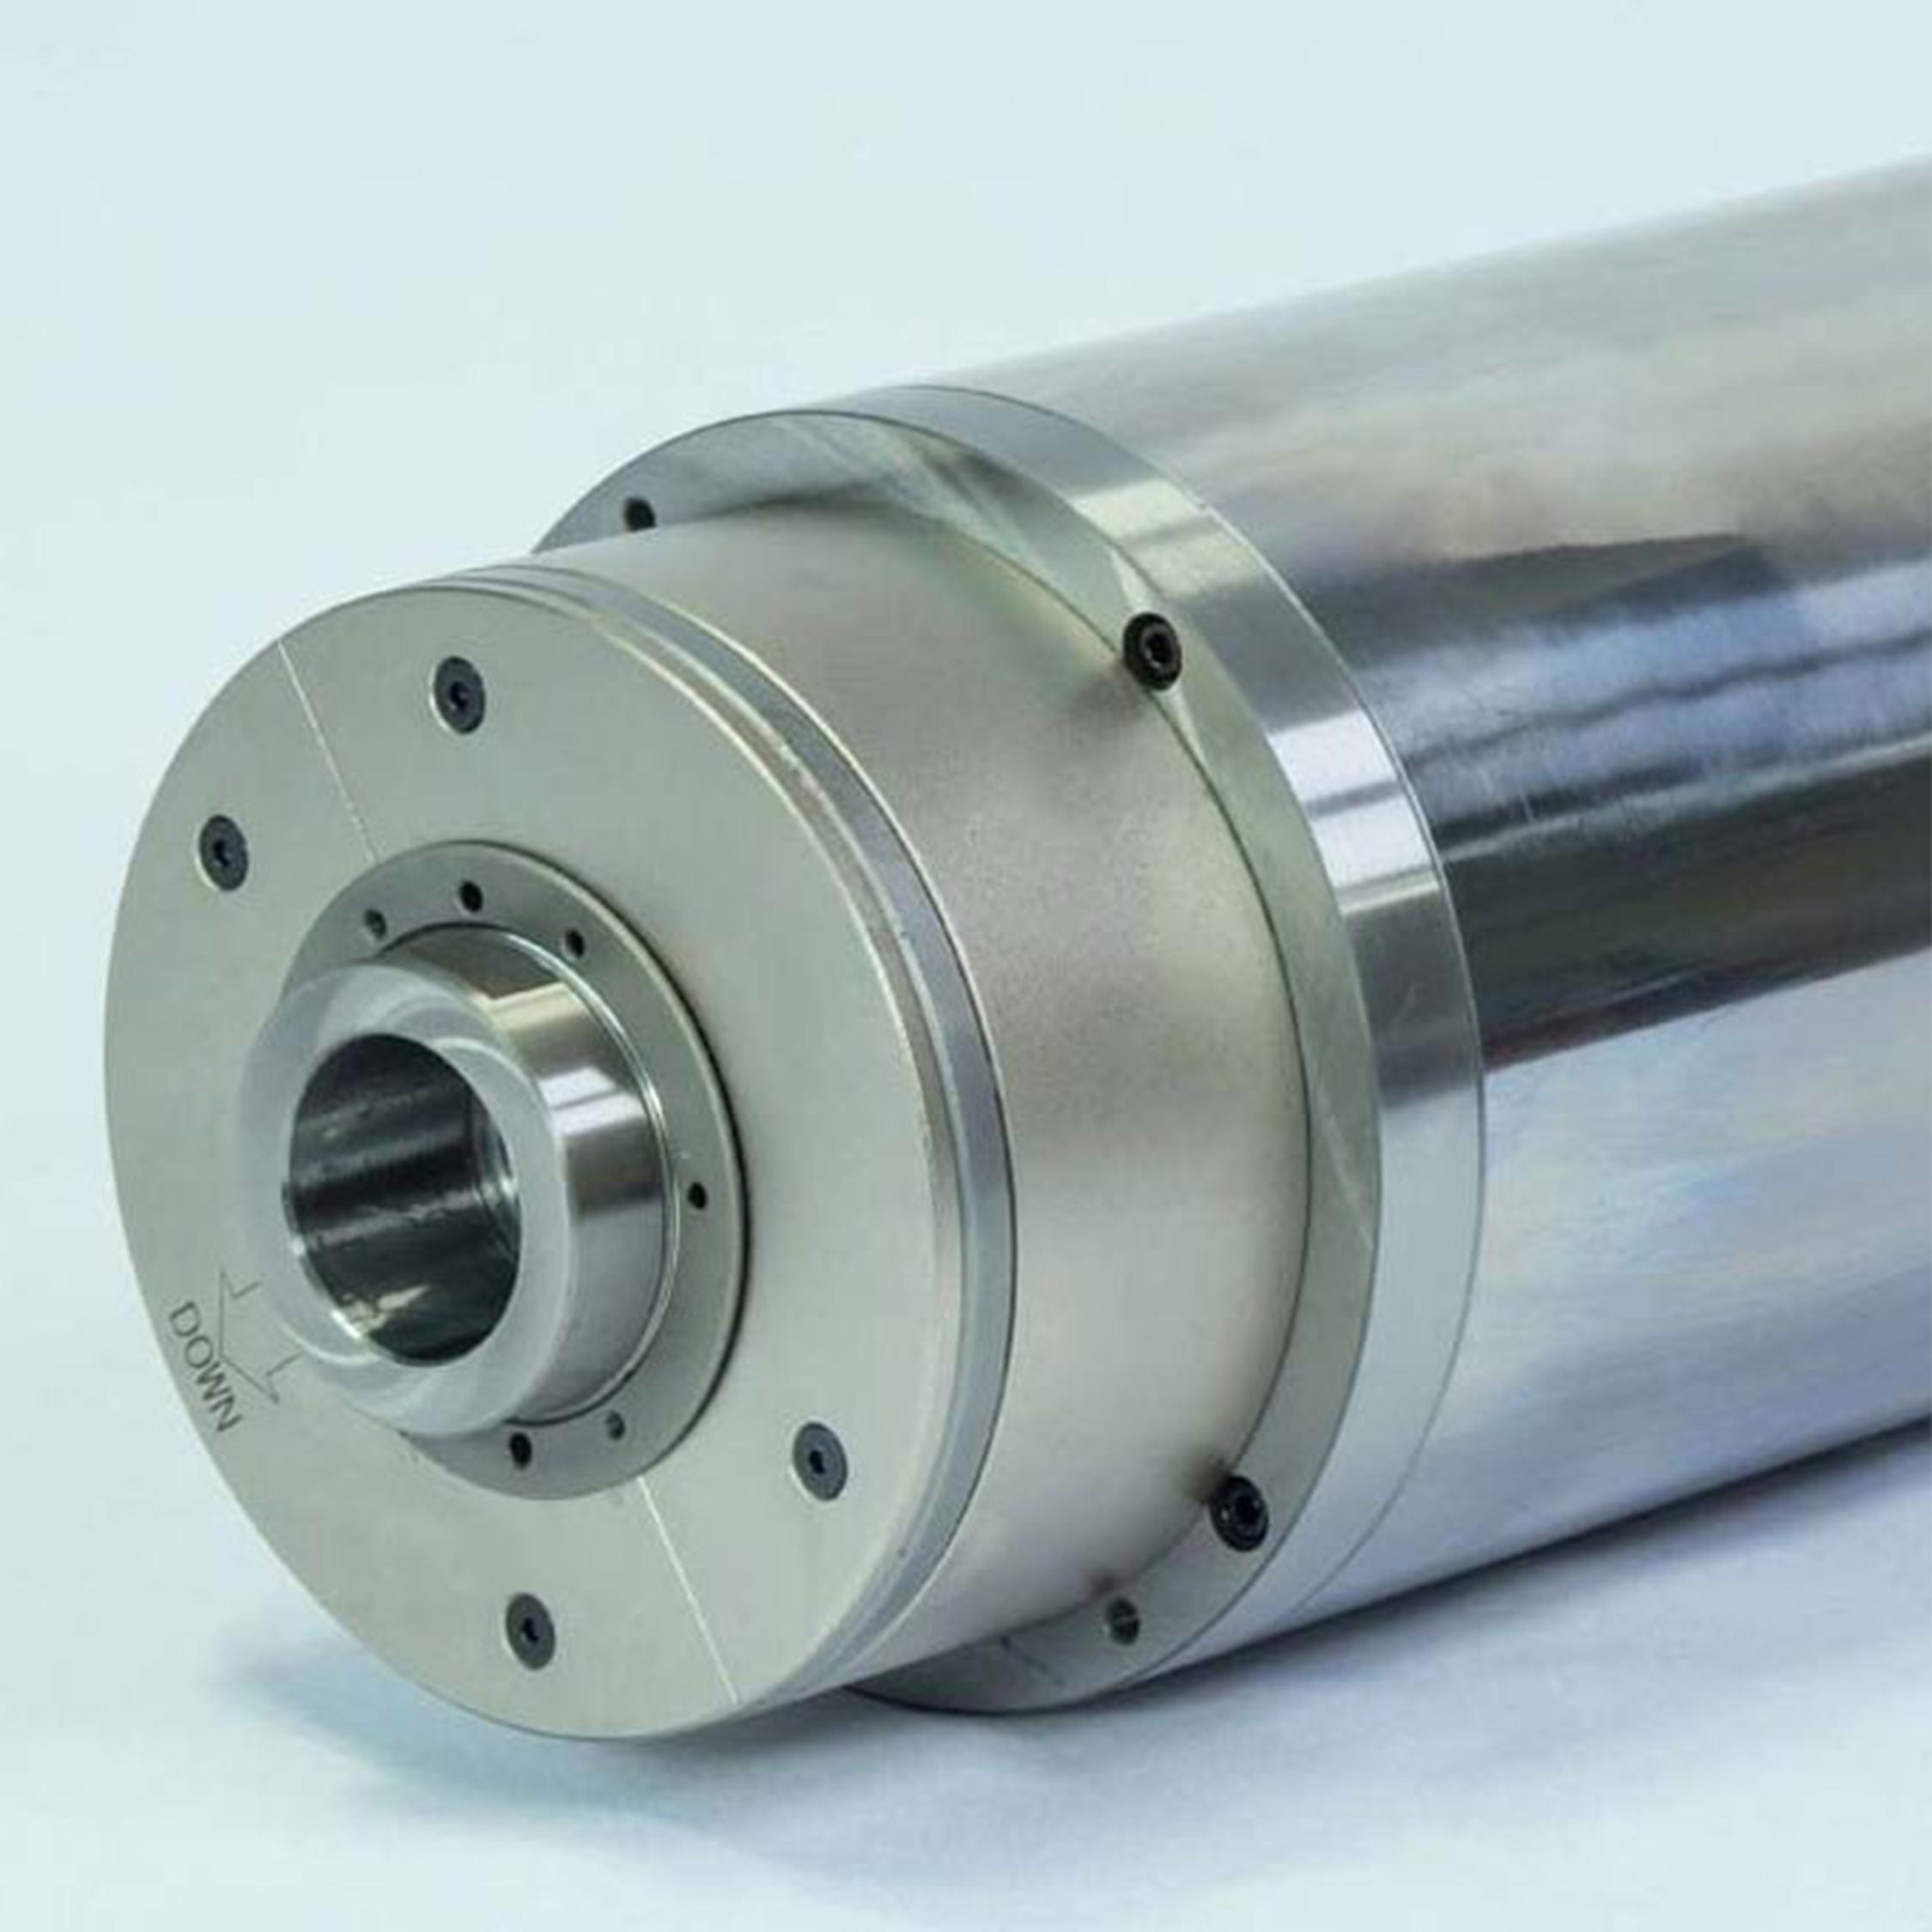 h.s spindle motors